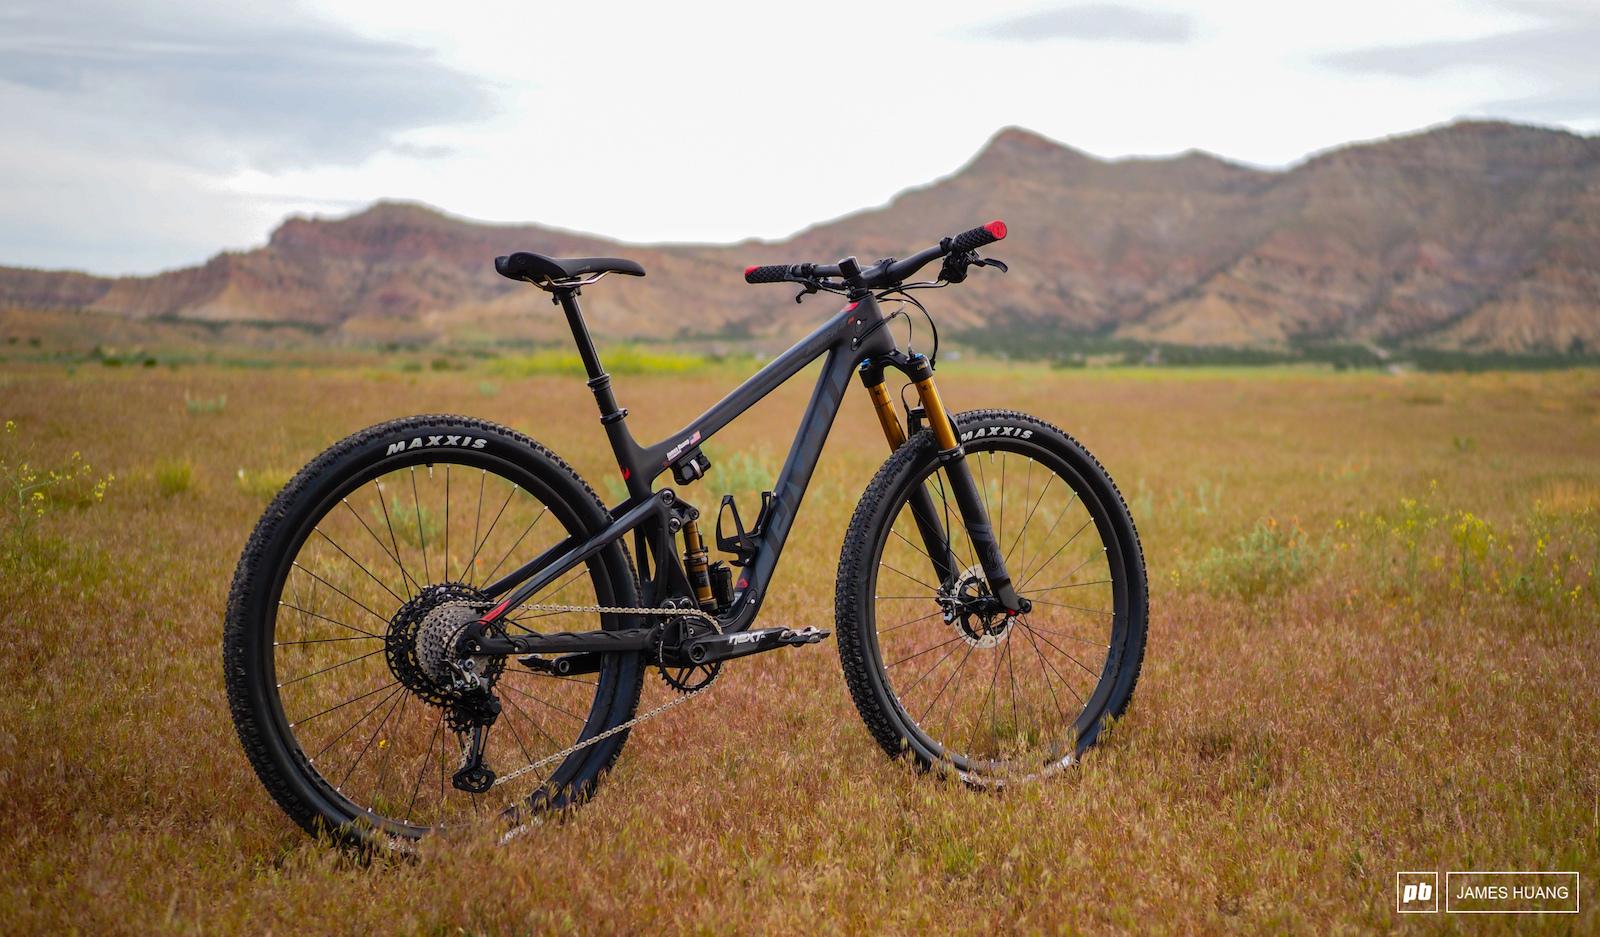 Best Xc Mountain Bike 2020 First Ride: Pivot's XC Race Ready 2020 Mach 4 SL   Pinkbike